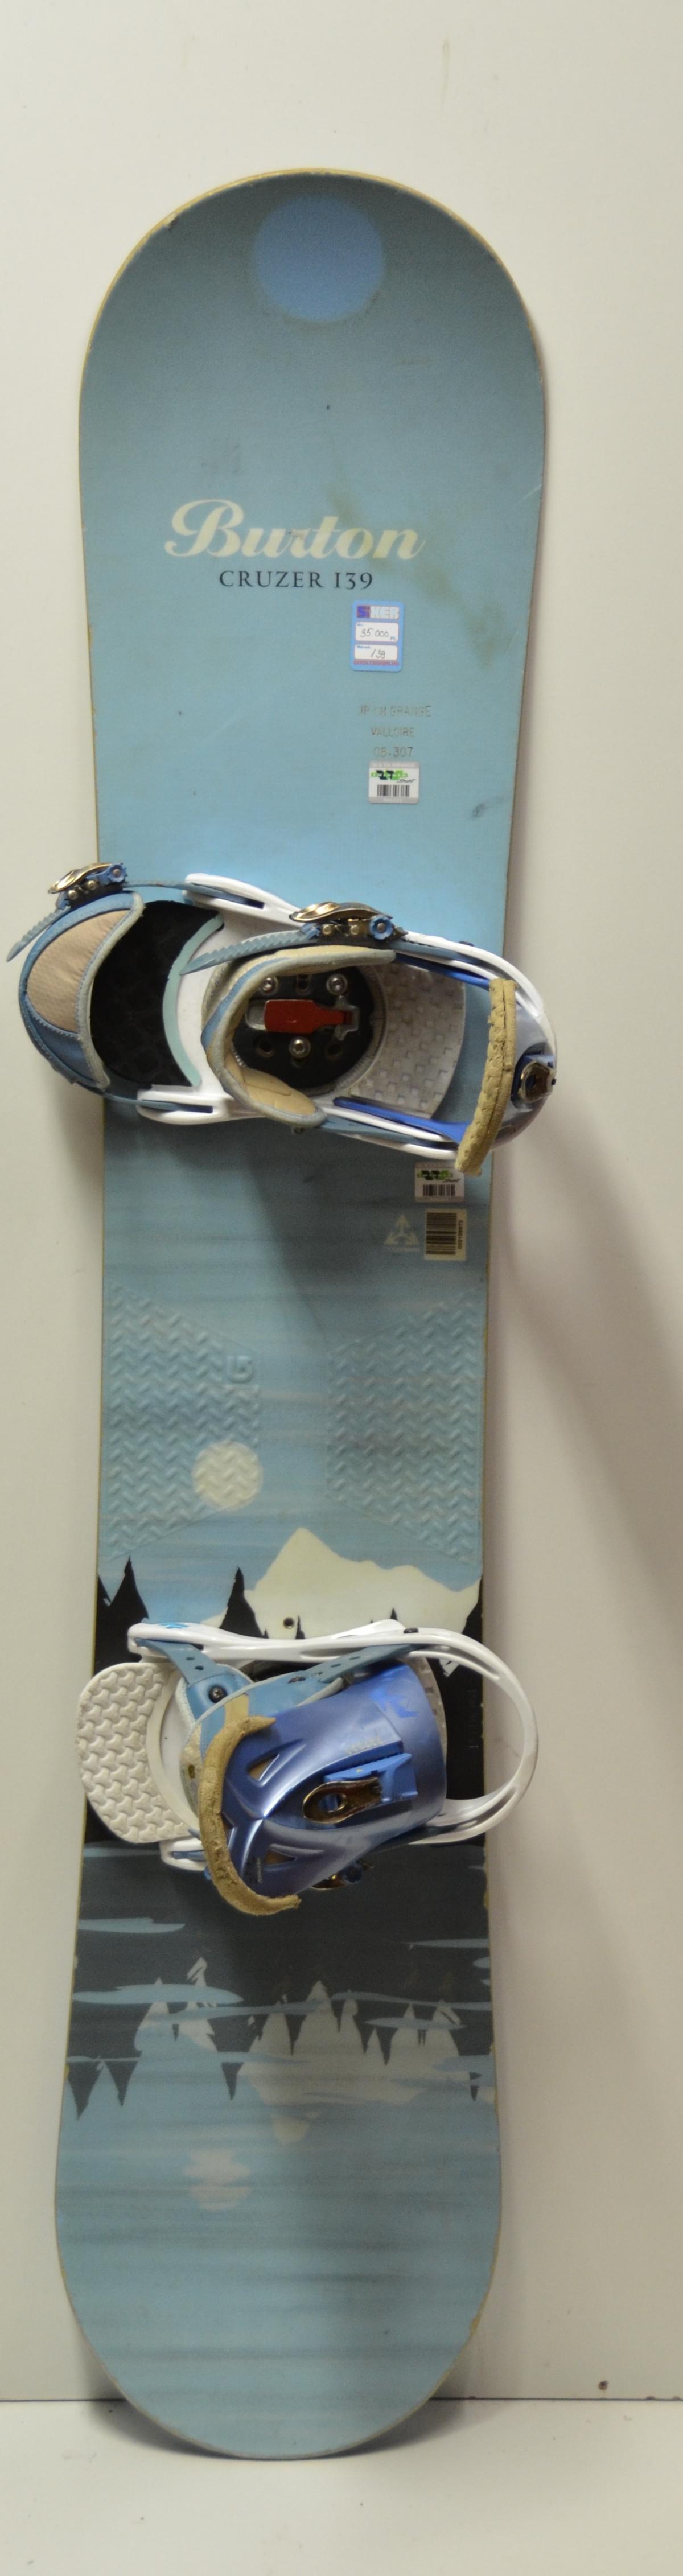 Burton Cruzer snowboard